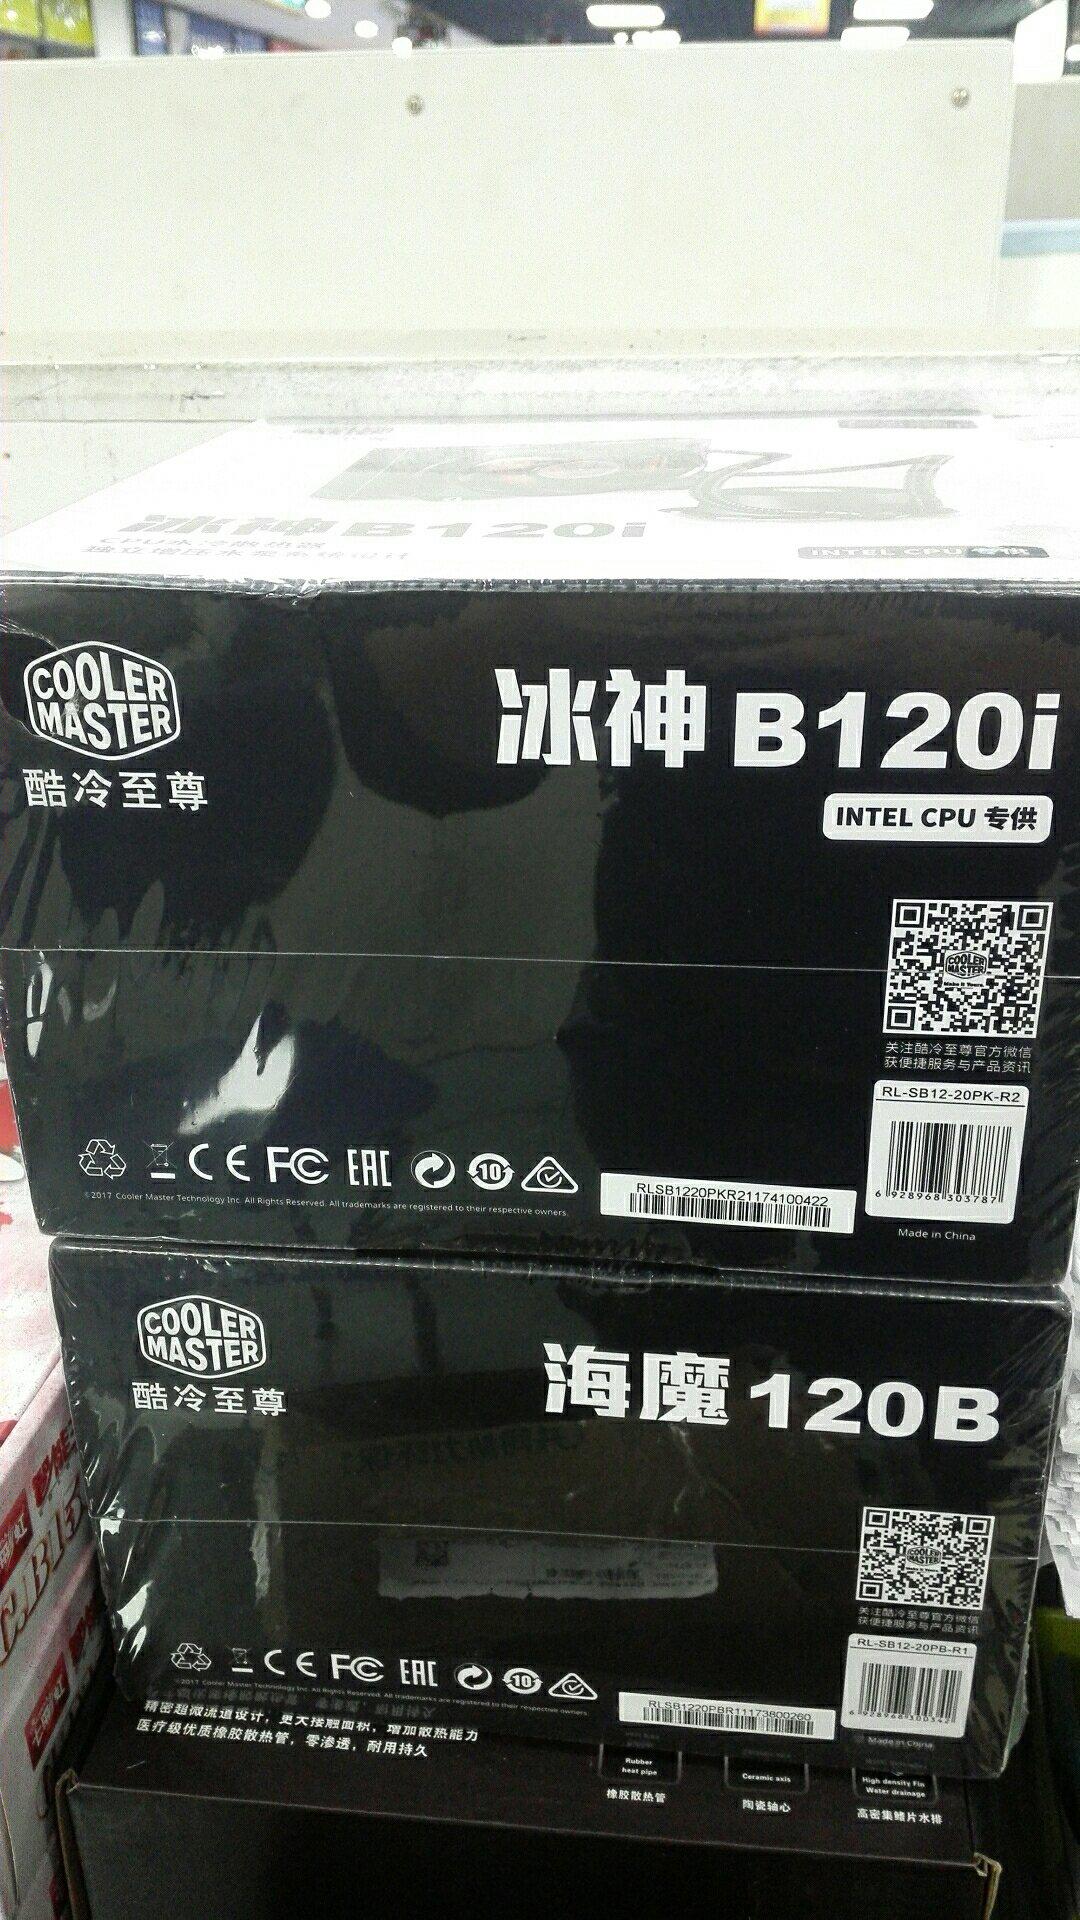 mens slide sandals size 14 009106459 bags